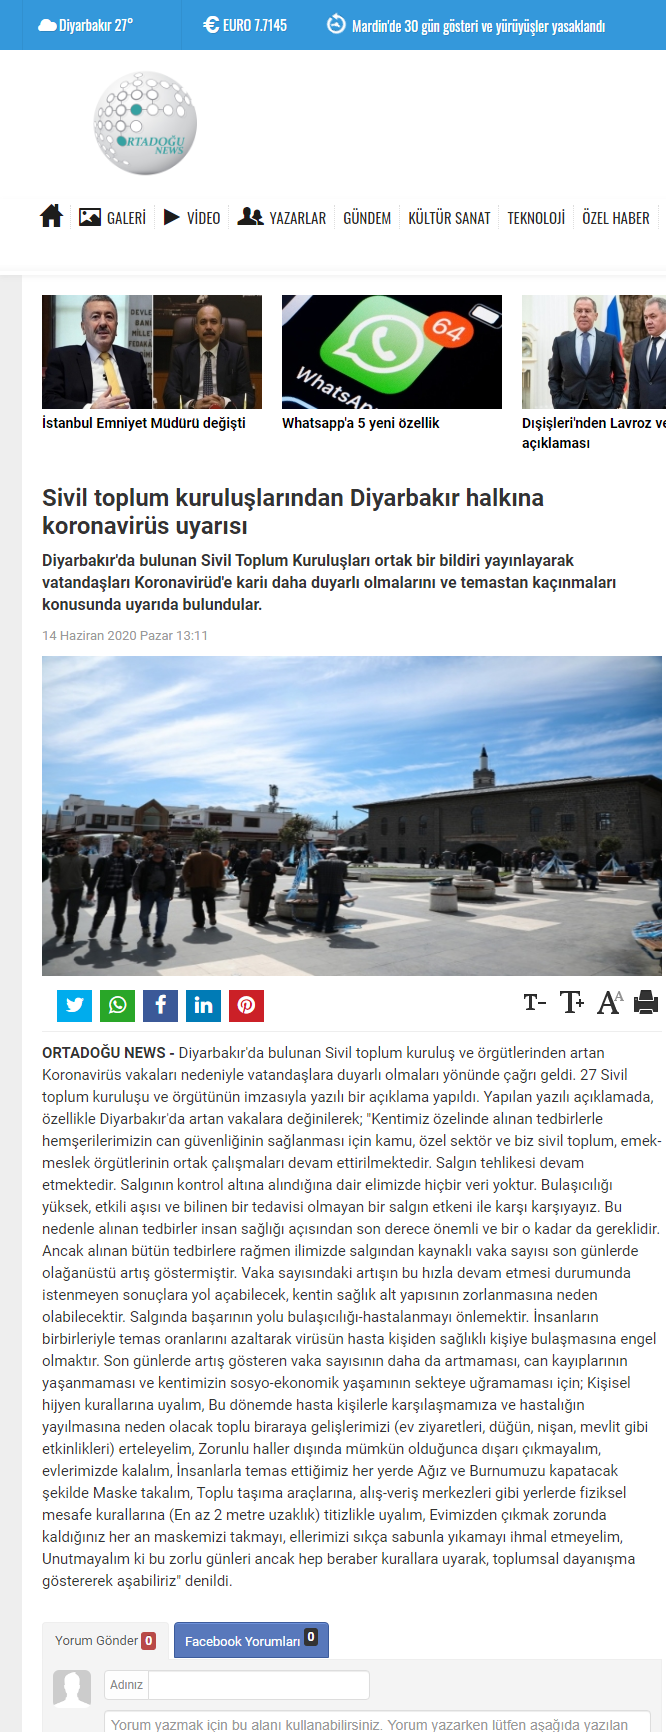 2020 06 15 SİVİL TOPLUM KURULUŞLARINDAN DİYARBAKIR HALKINA KORONAVİRÜS UYARISI (ortadogunews.com)